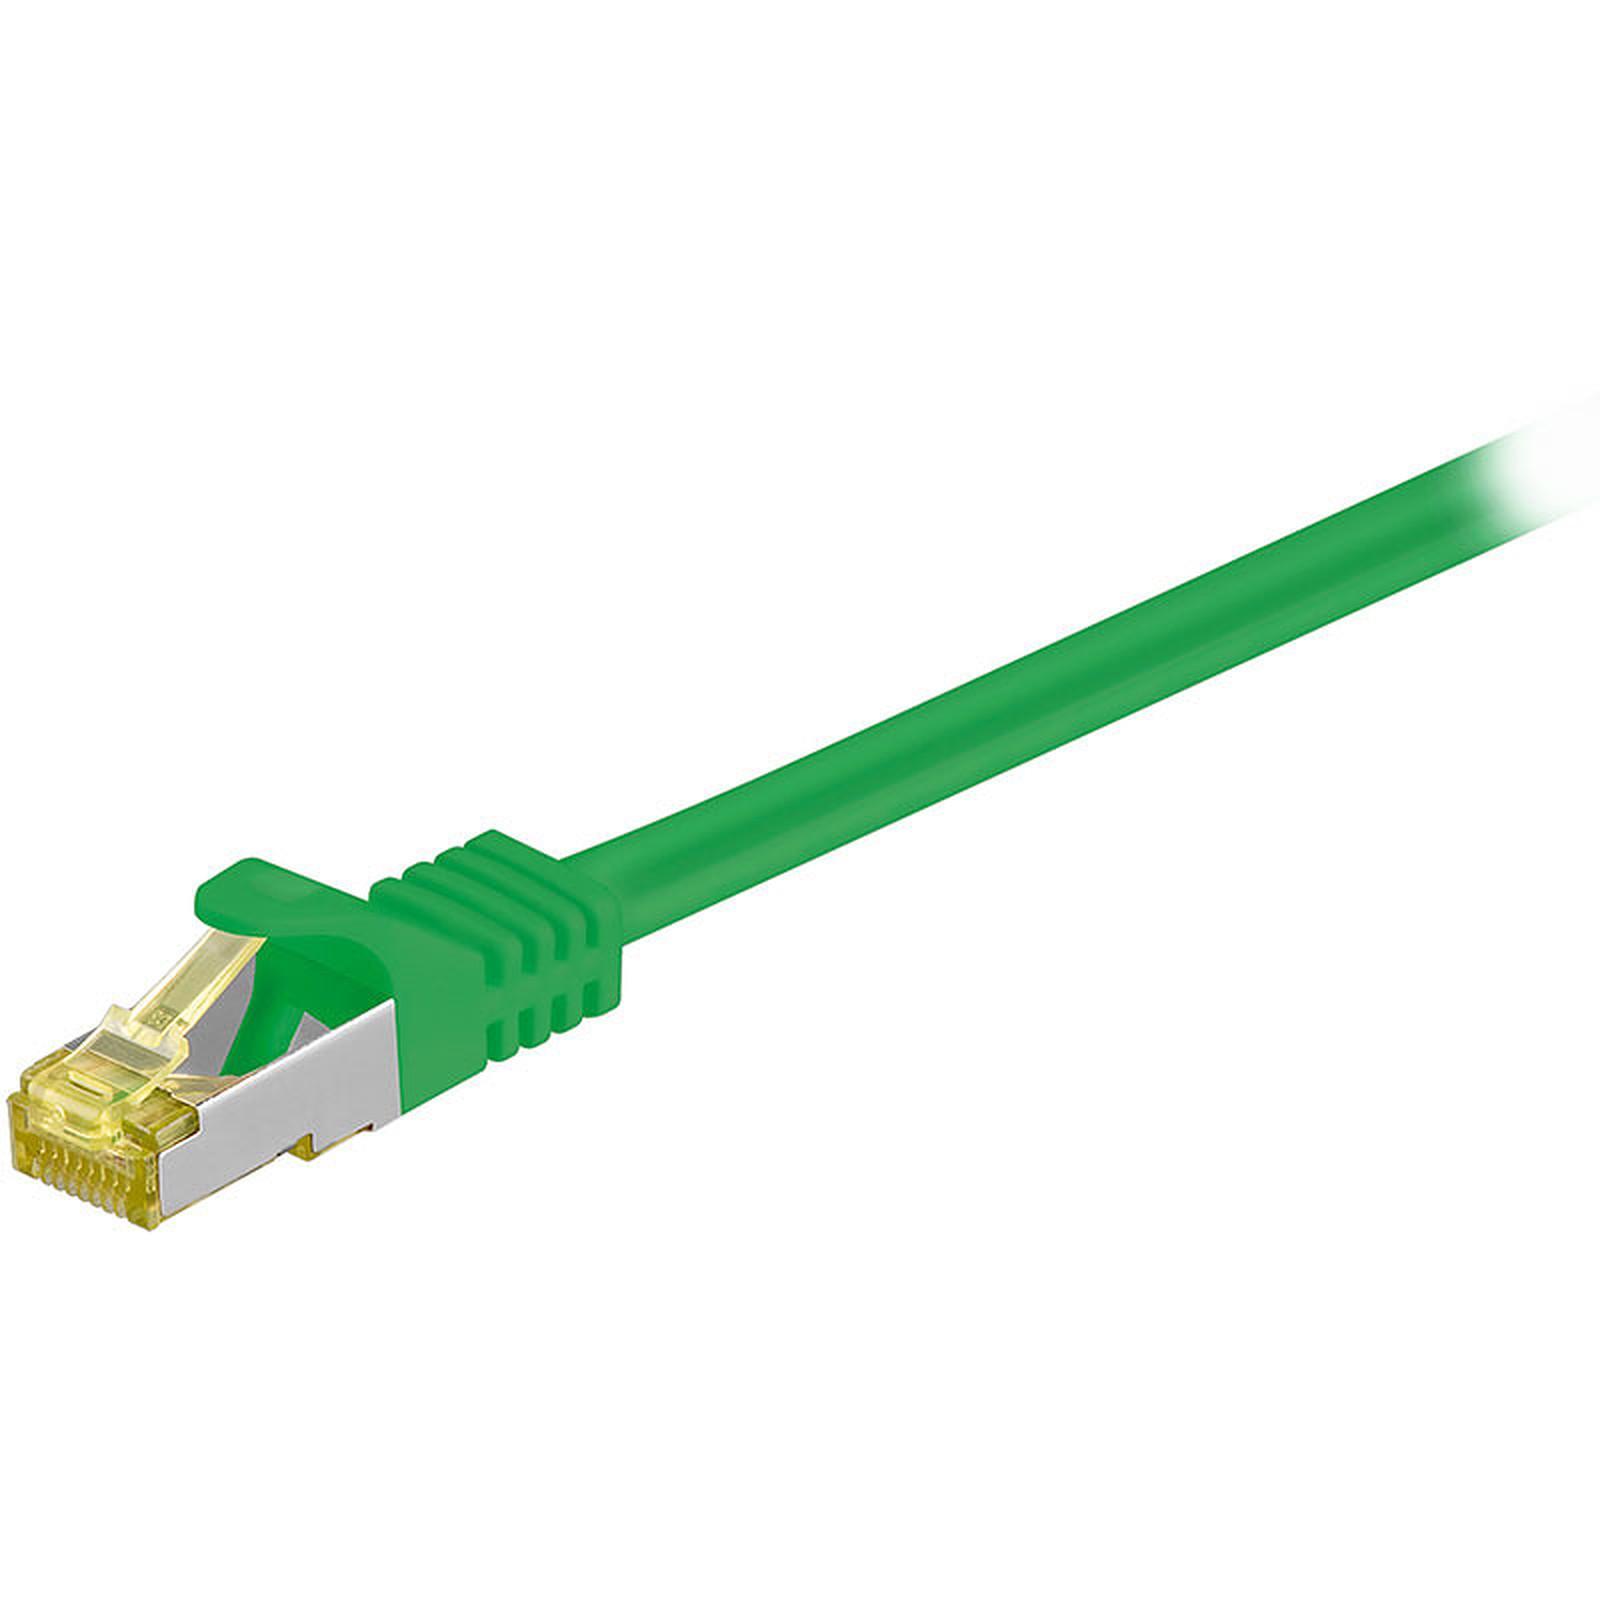 Cable RJ45 categoría 7 S/FTP 1 m (verde)